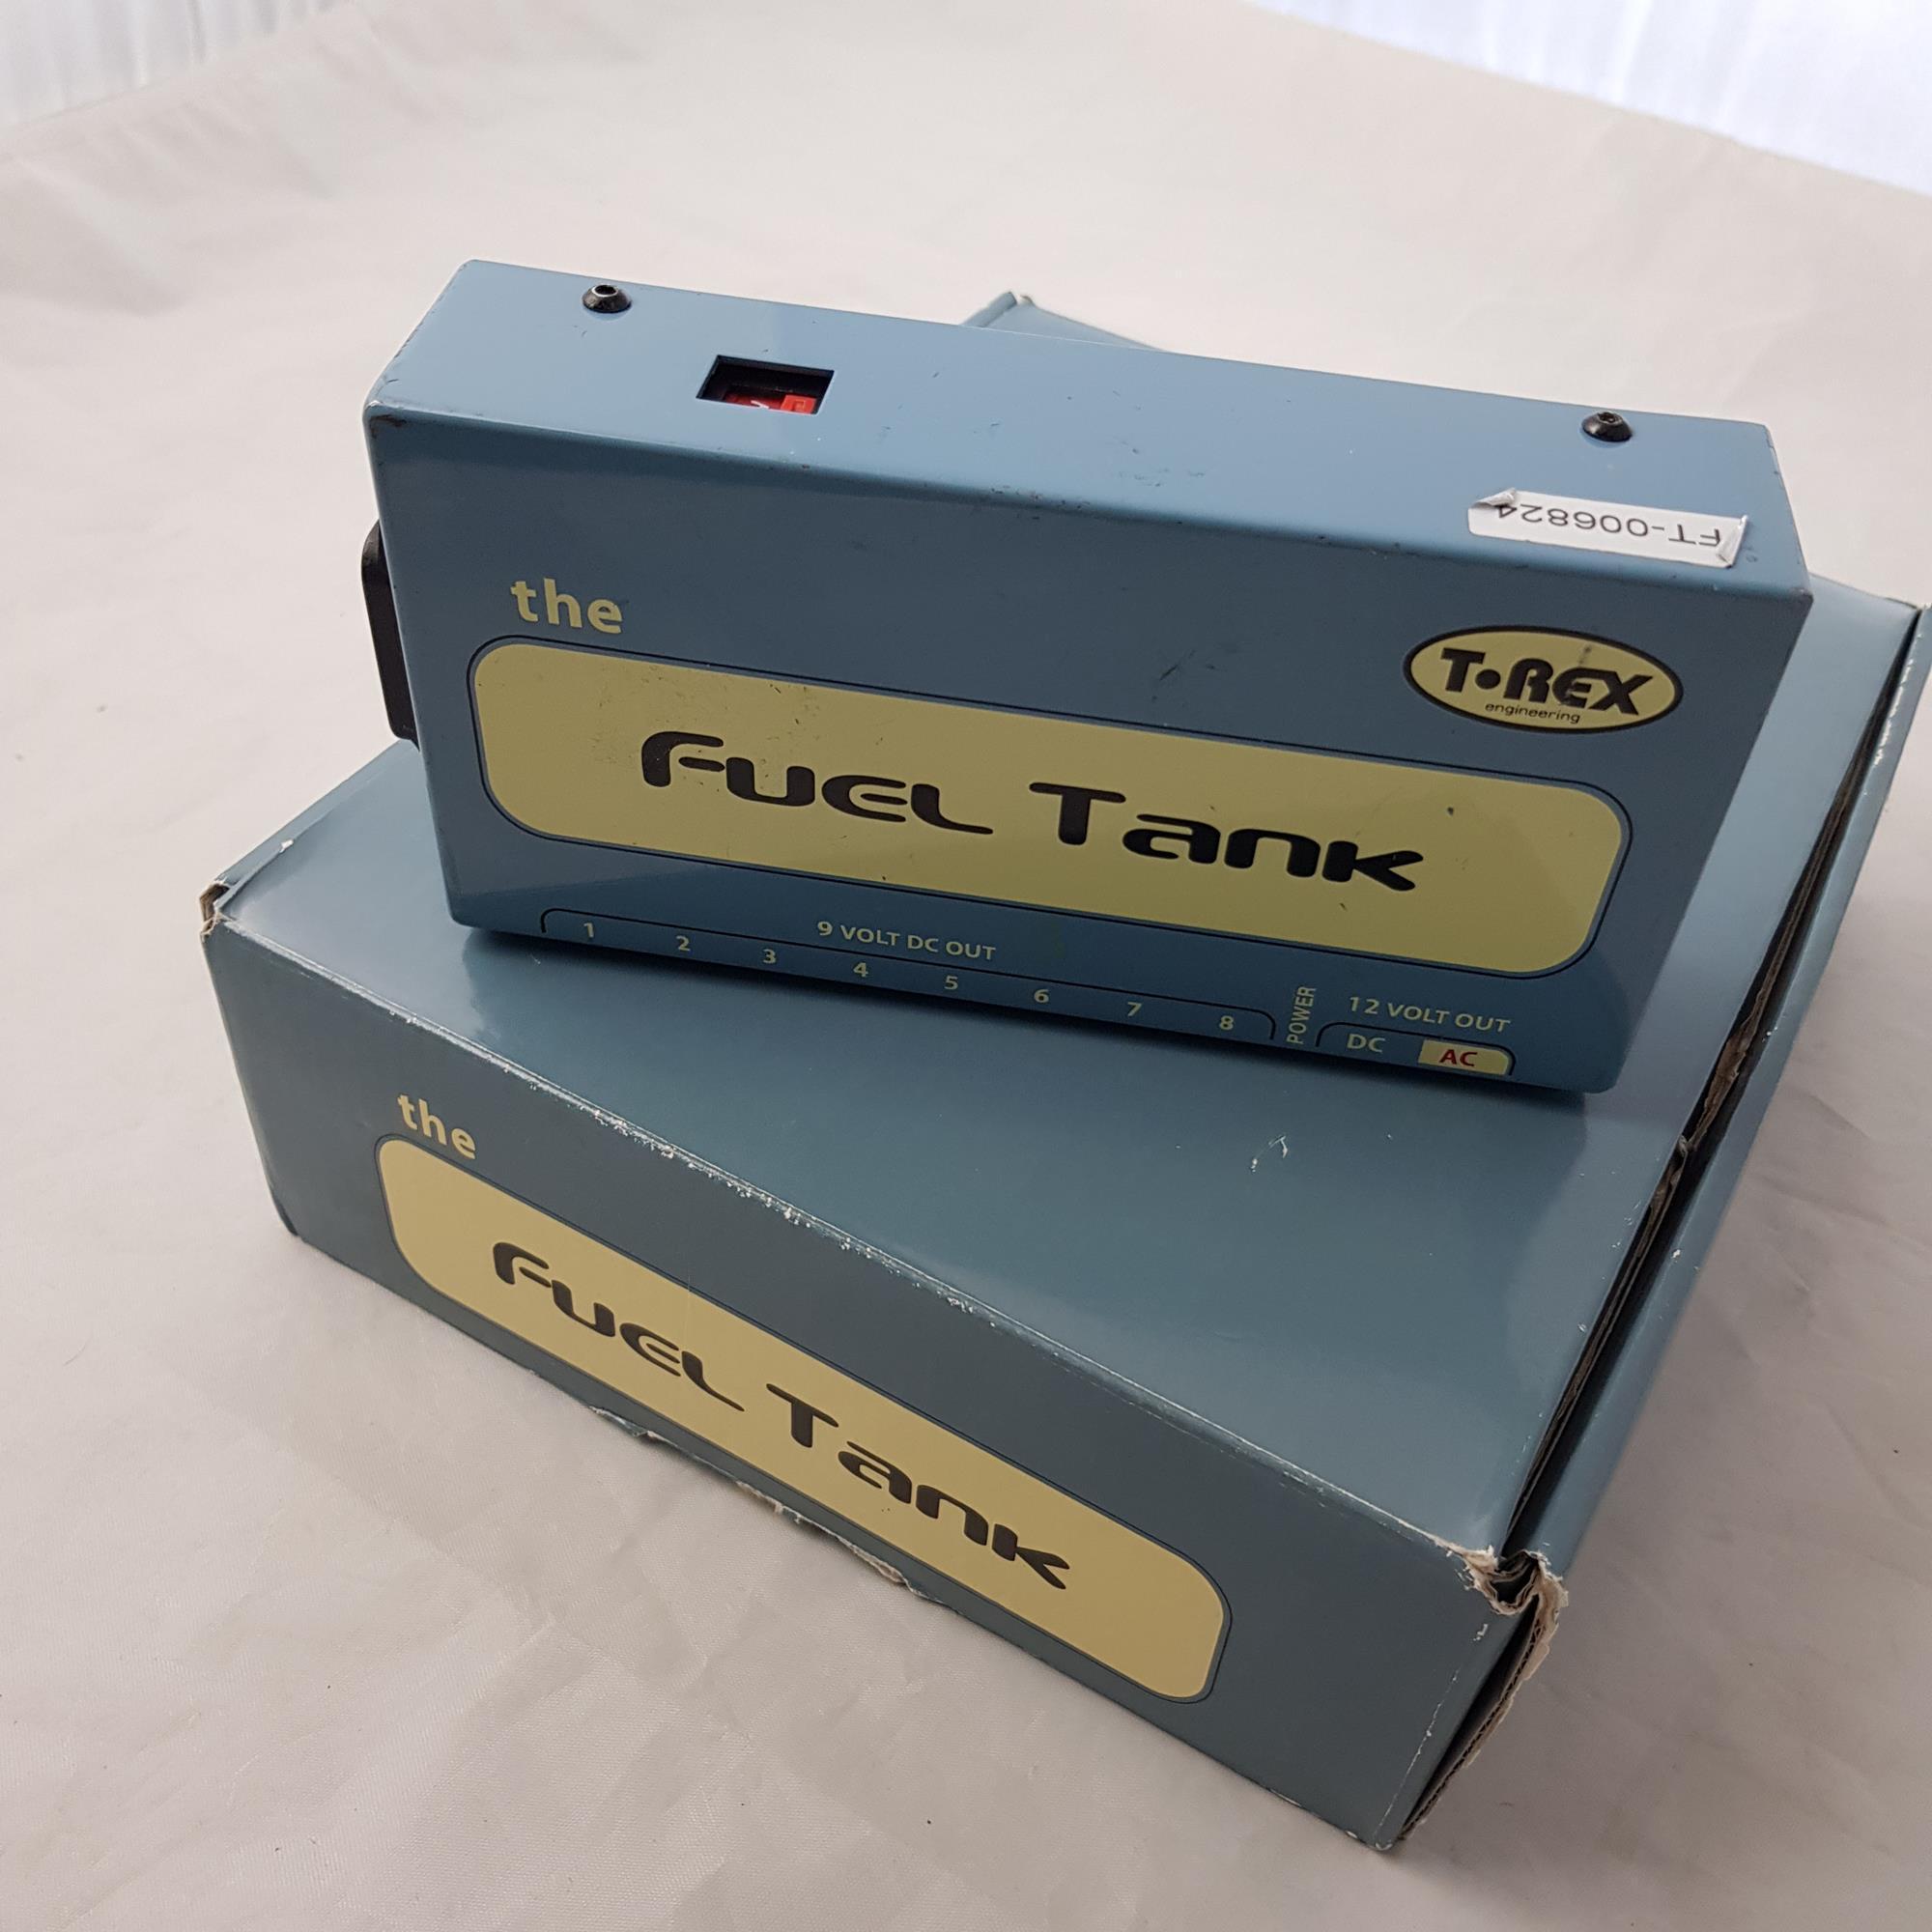 T-REX-FUEL-TANK-POWERSUPPLY-sku-1617379427832